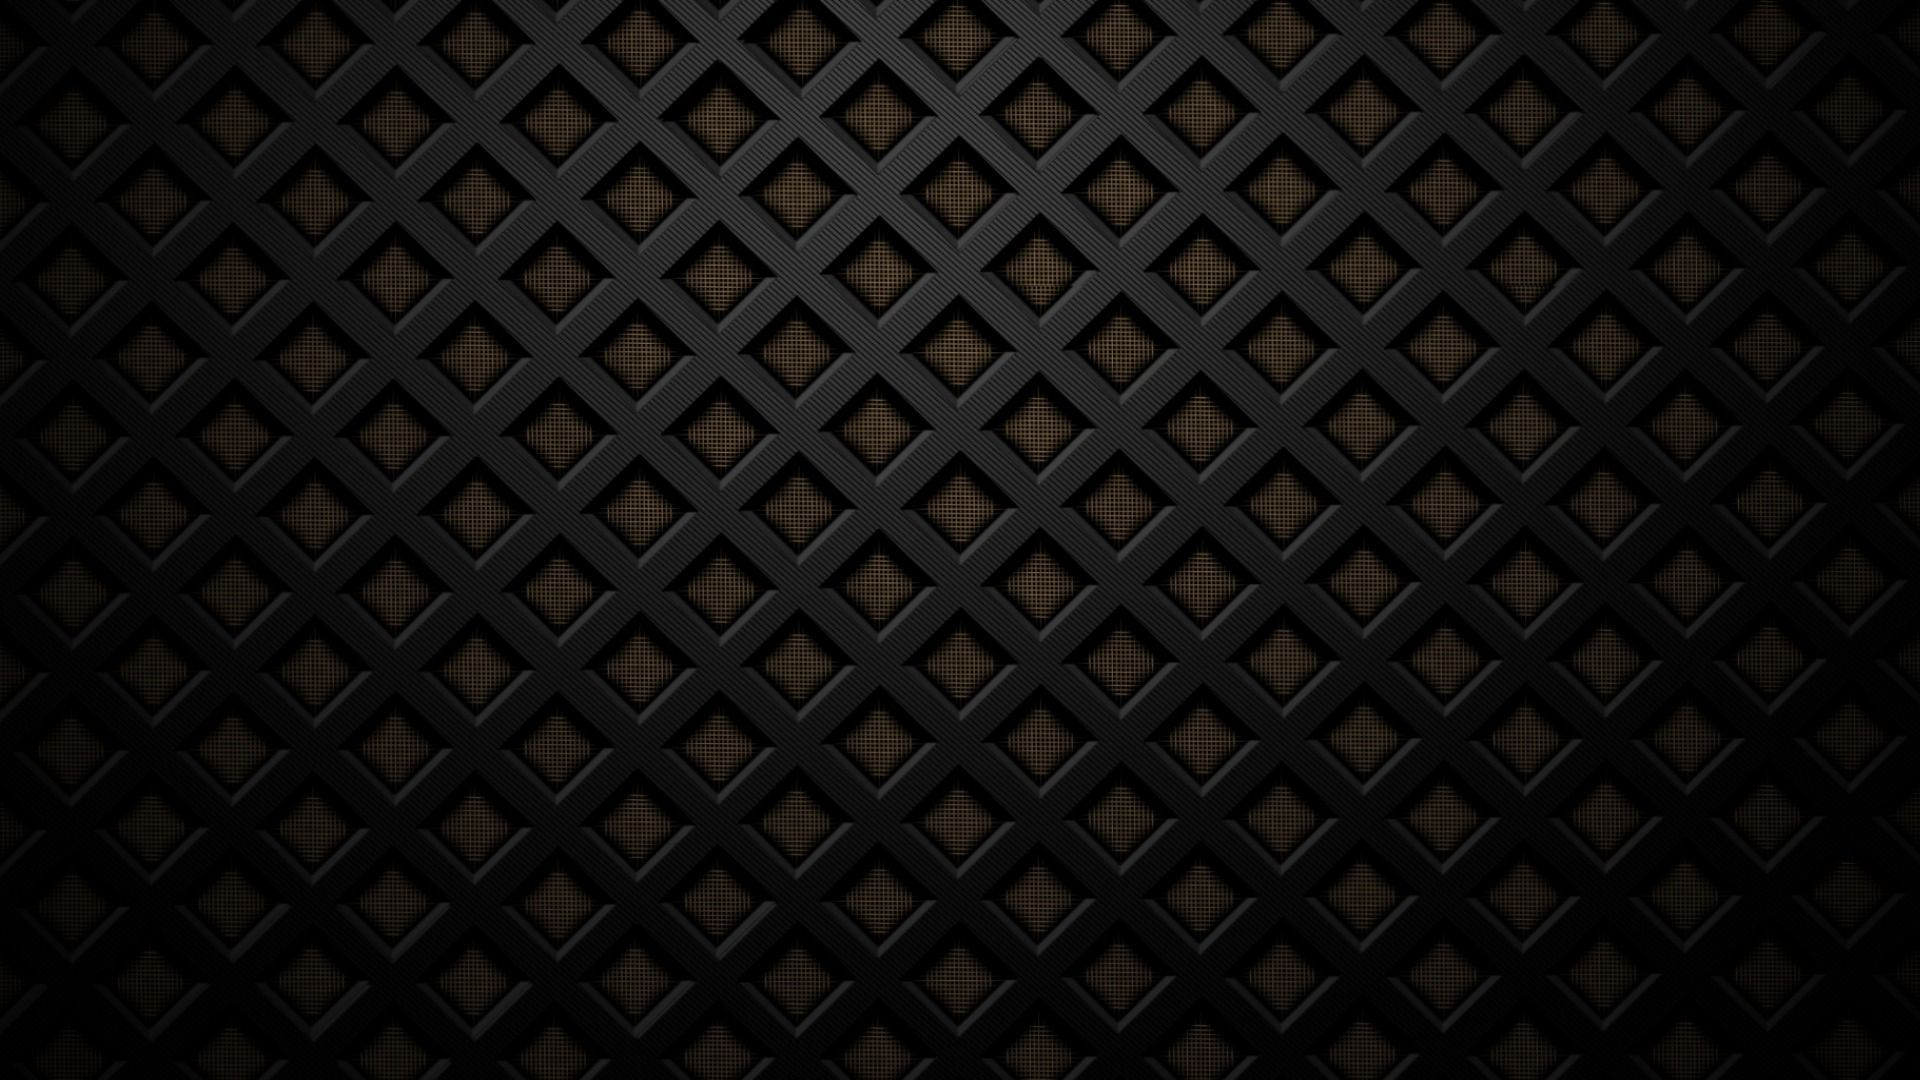 Pin By Ivan Ivanov On Reiseziele Black Textured Wallpaper Dark Wallpaper Textured Wallpaper